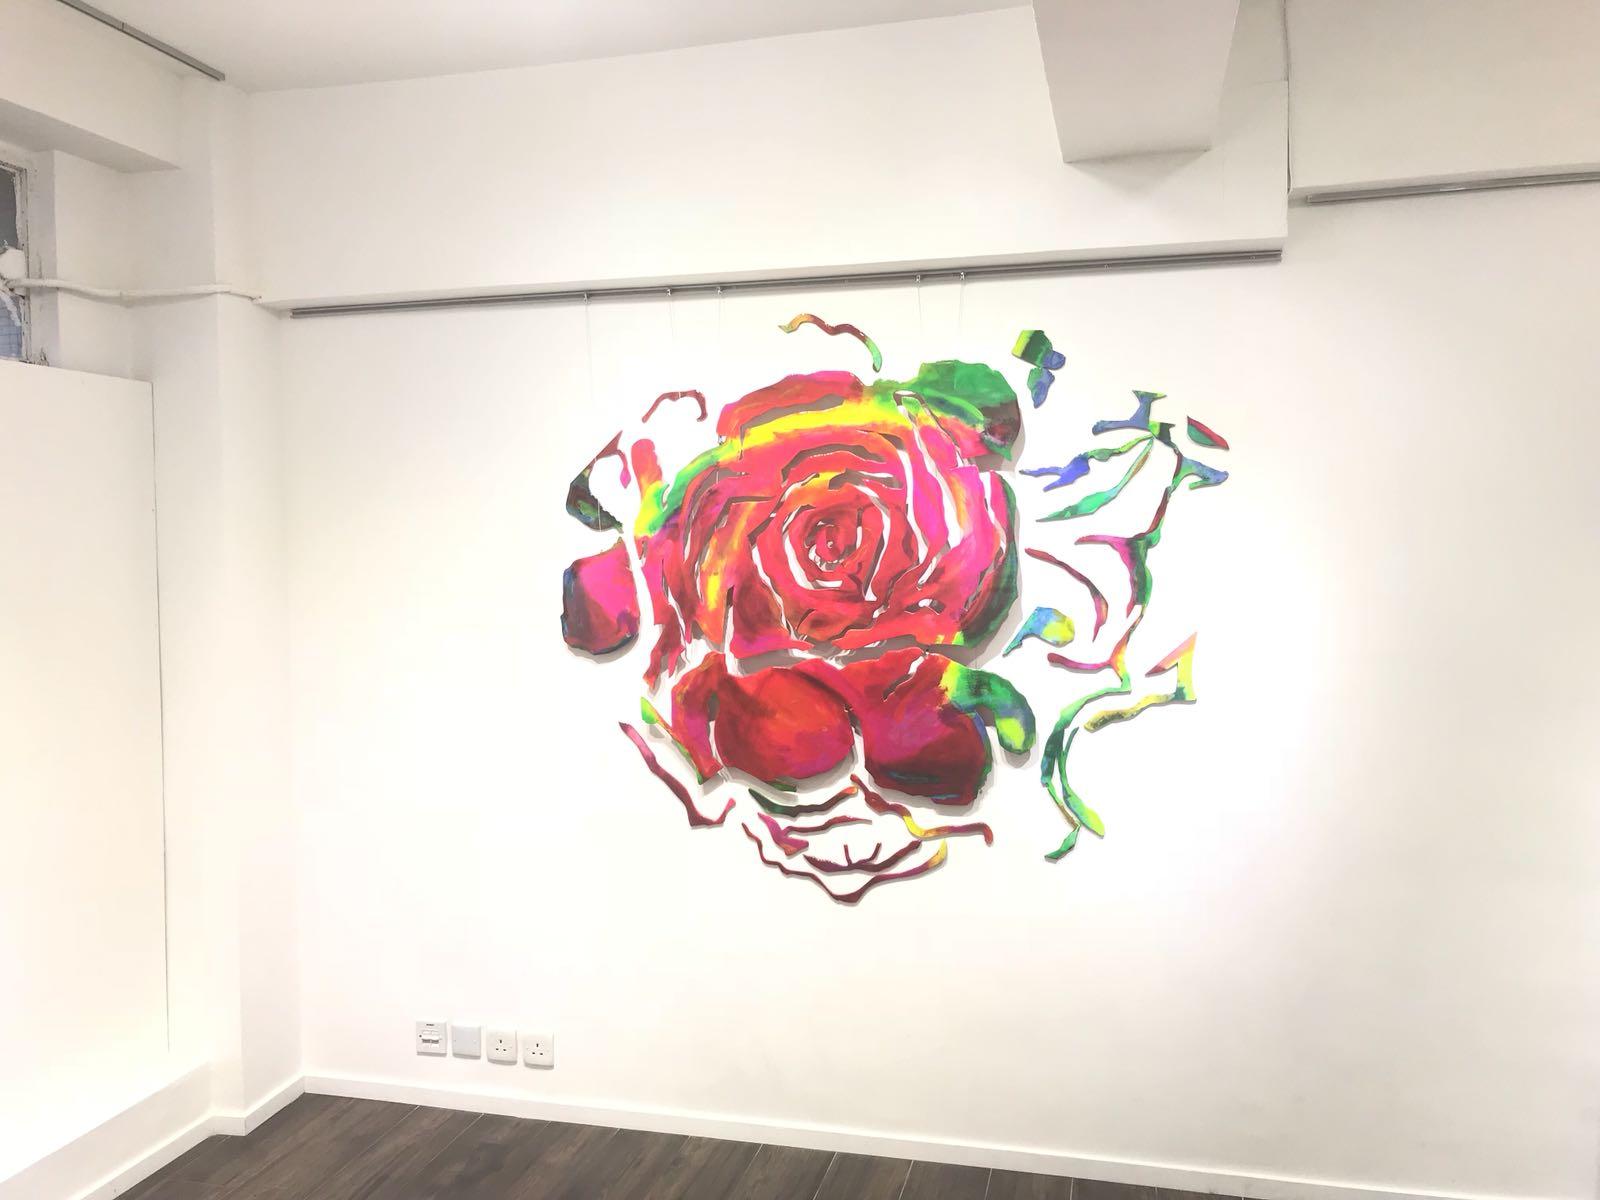 67511aaf b811 40a9 954f 6305a55c4bf9 Solo Exhibition Hong Kong Galería Koo.